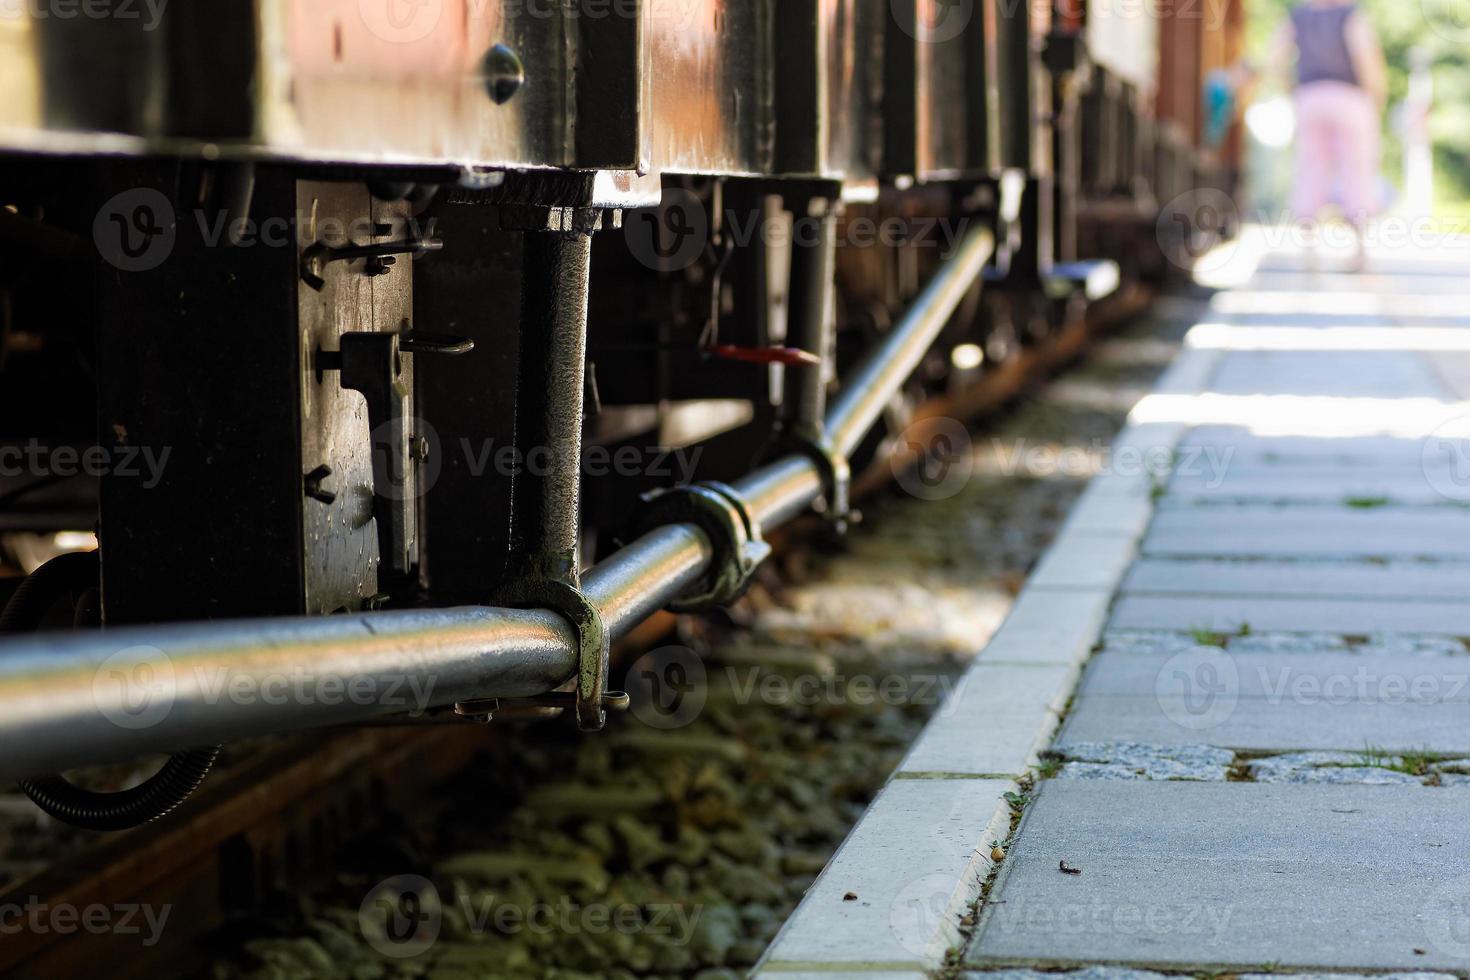 oude trein staande op het station. foto